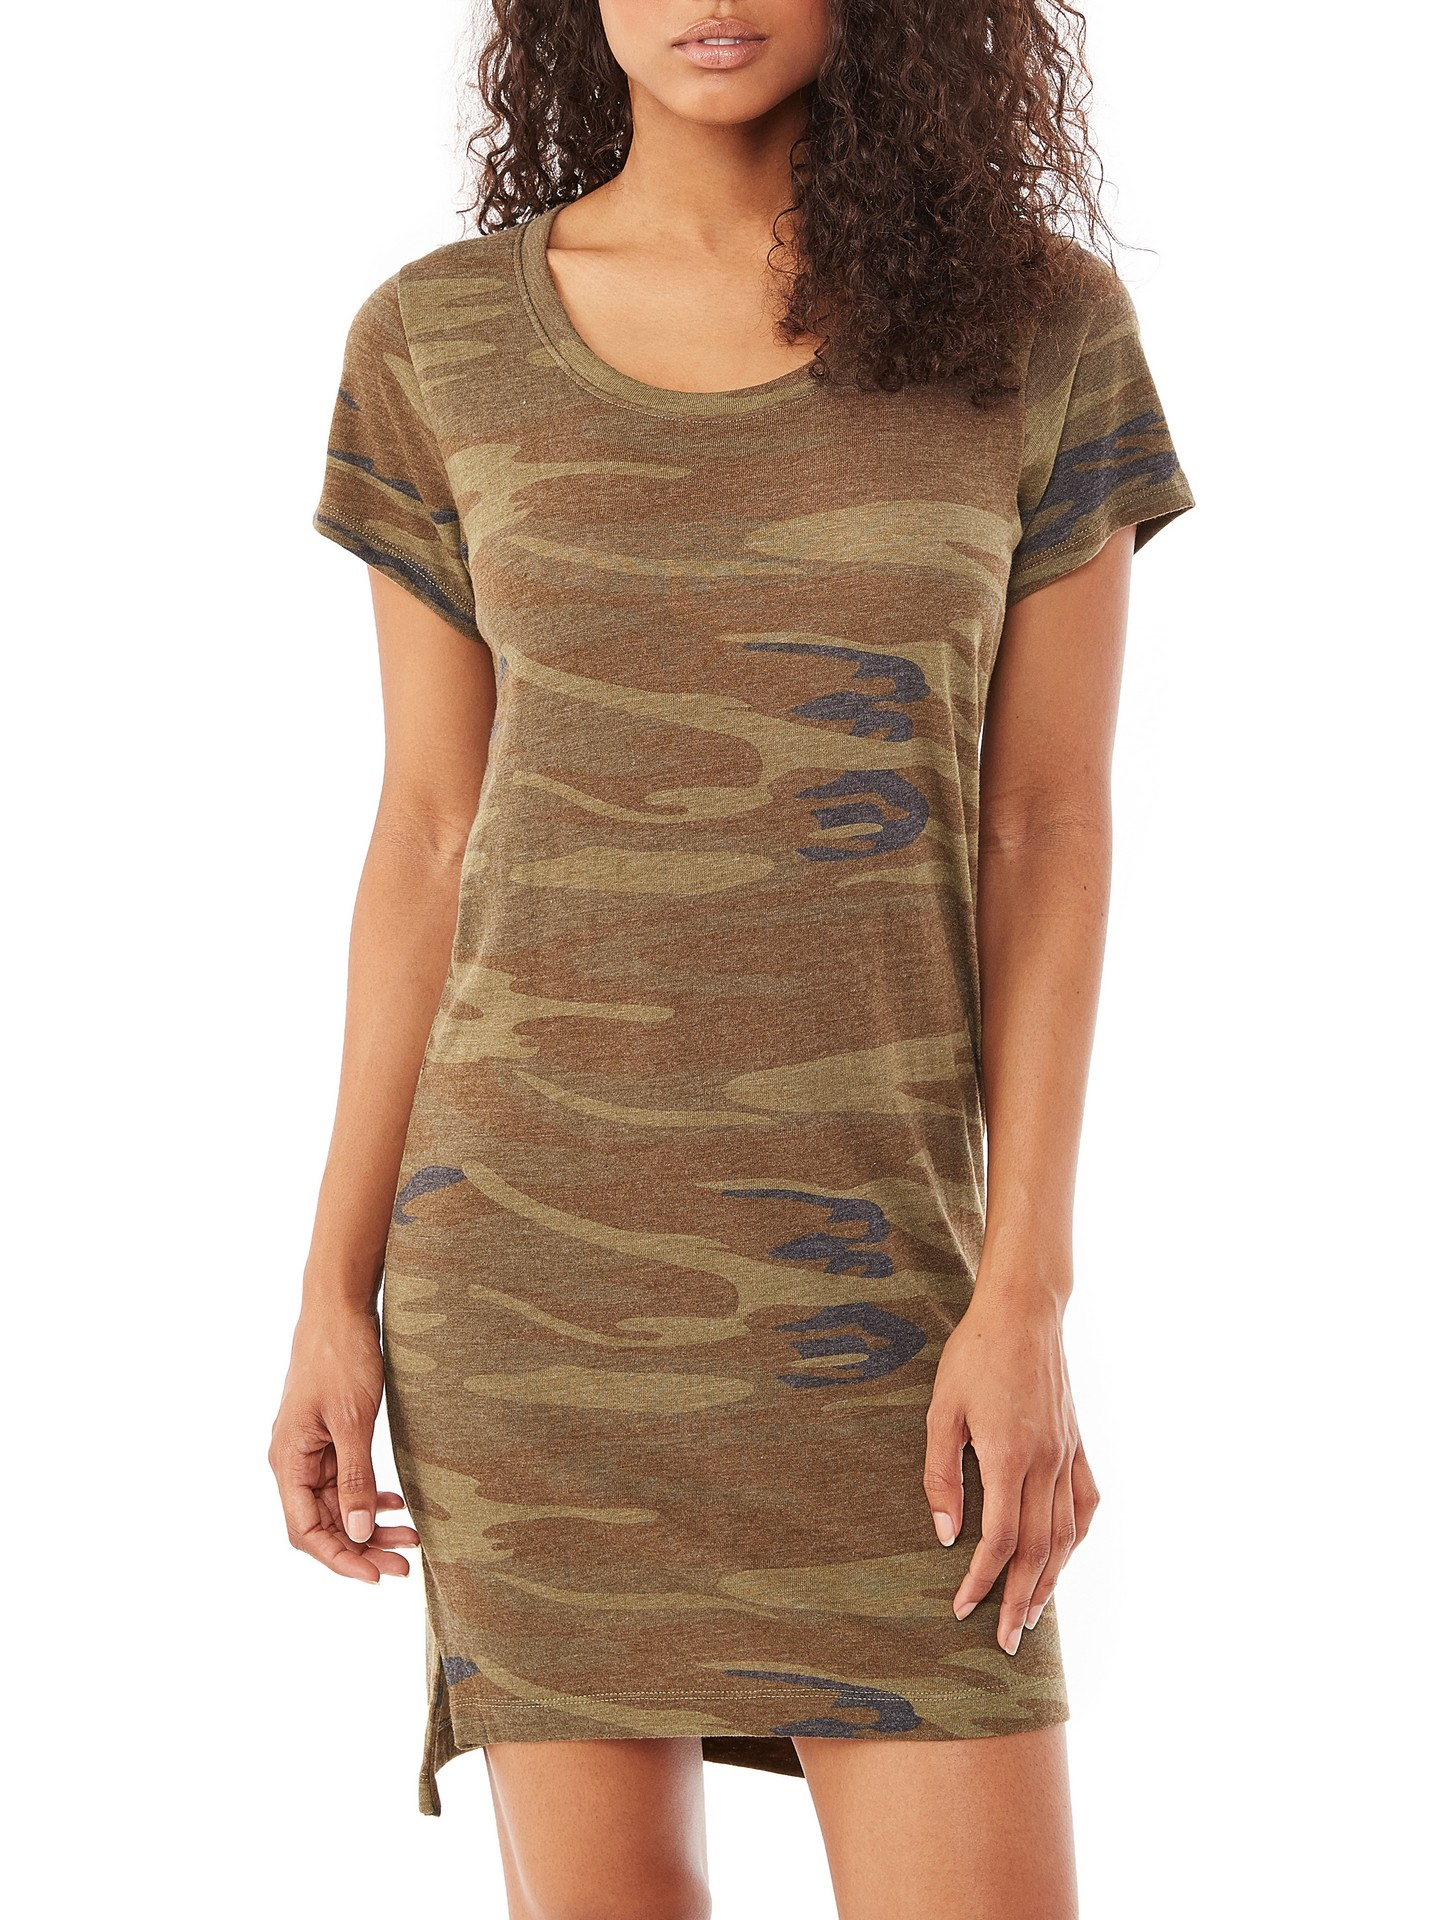 Alternative Apparel Dress January 2017